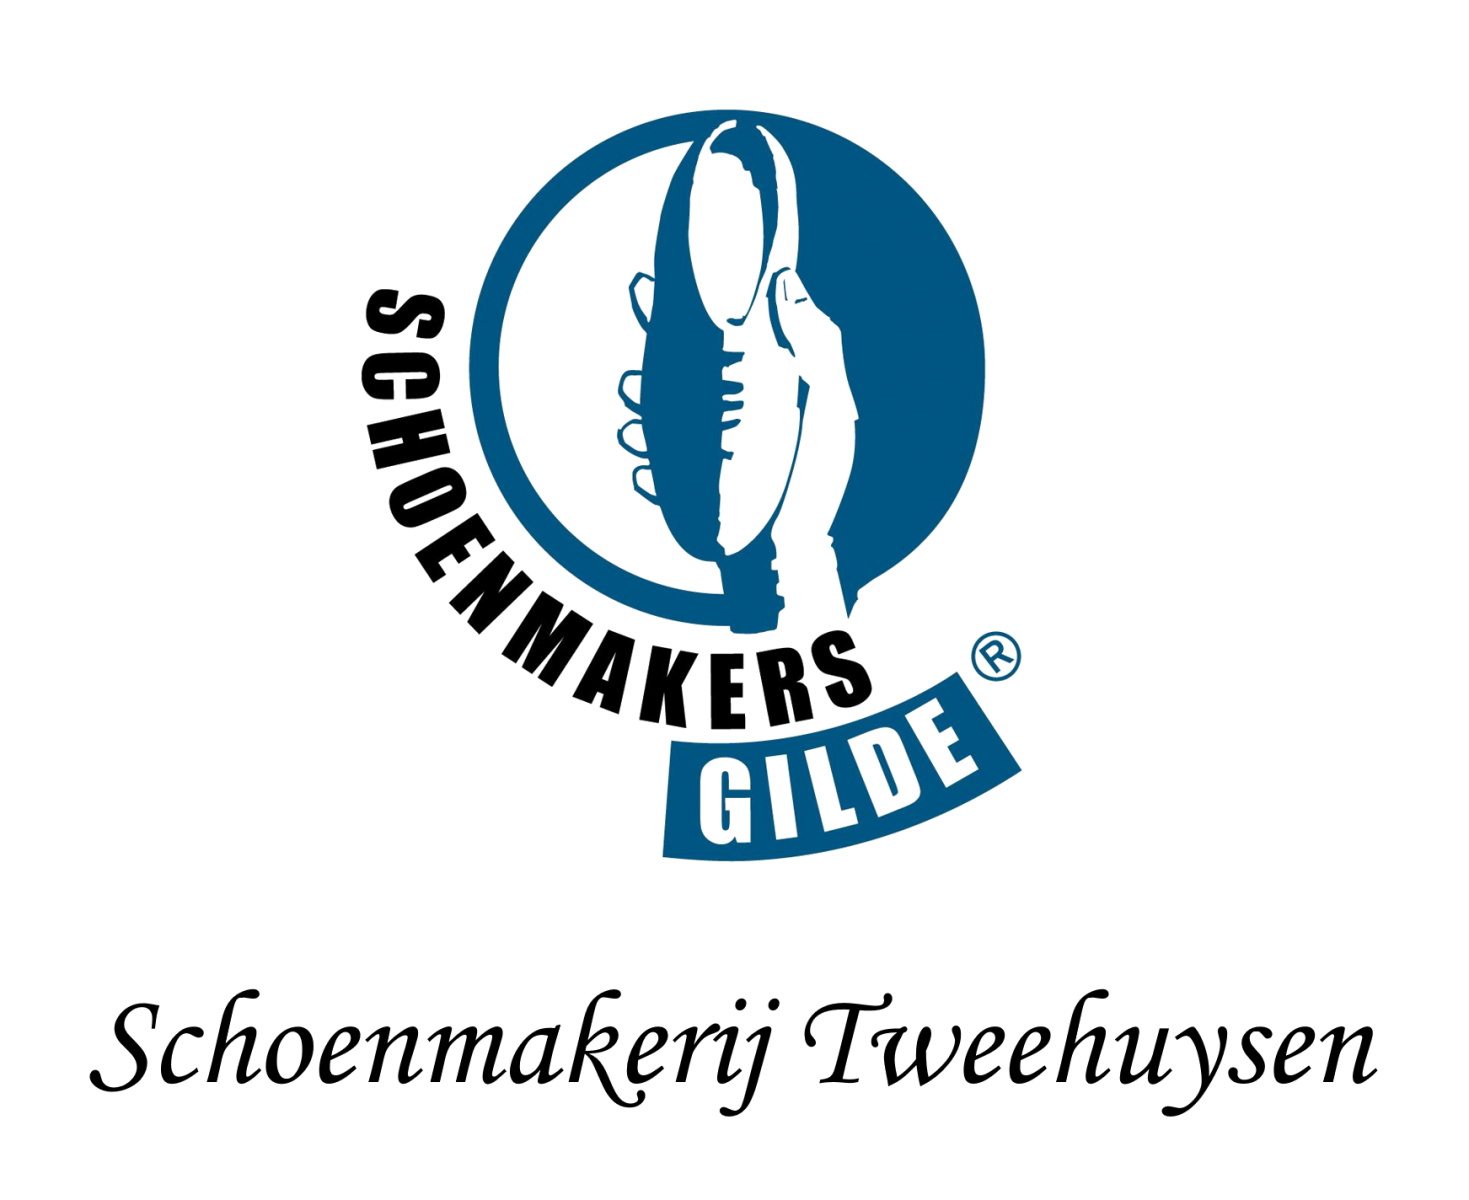 Schoenmakerij_Tweehuysen_logo_transparant